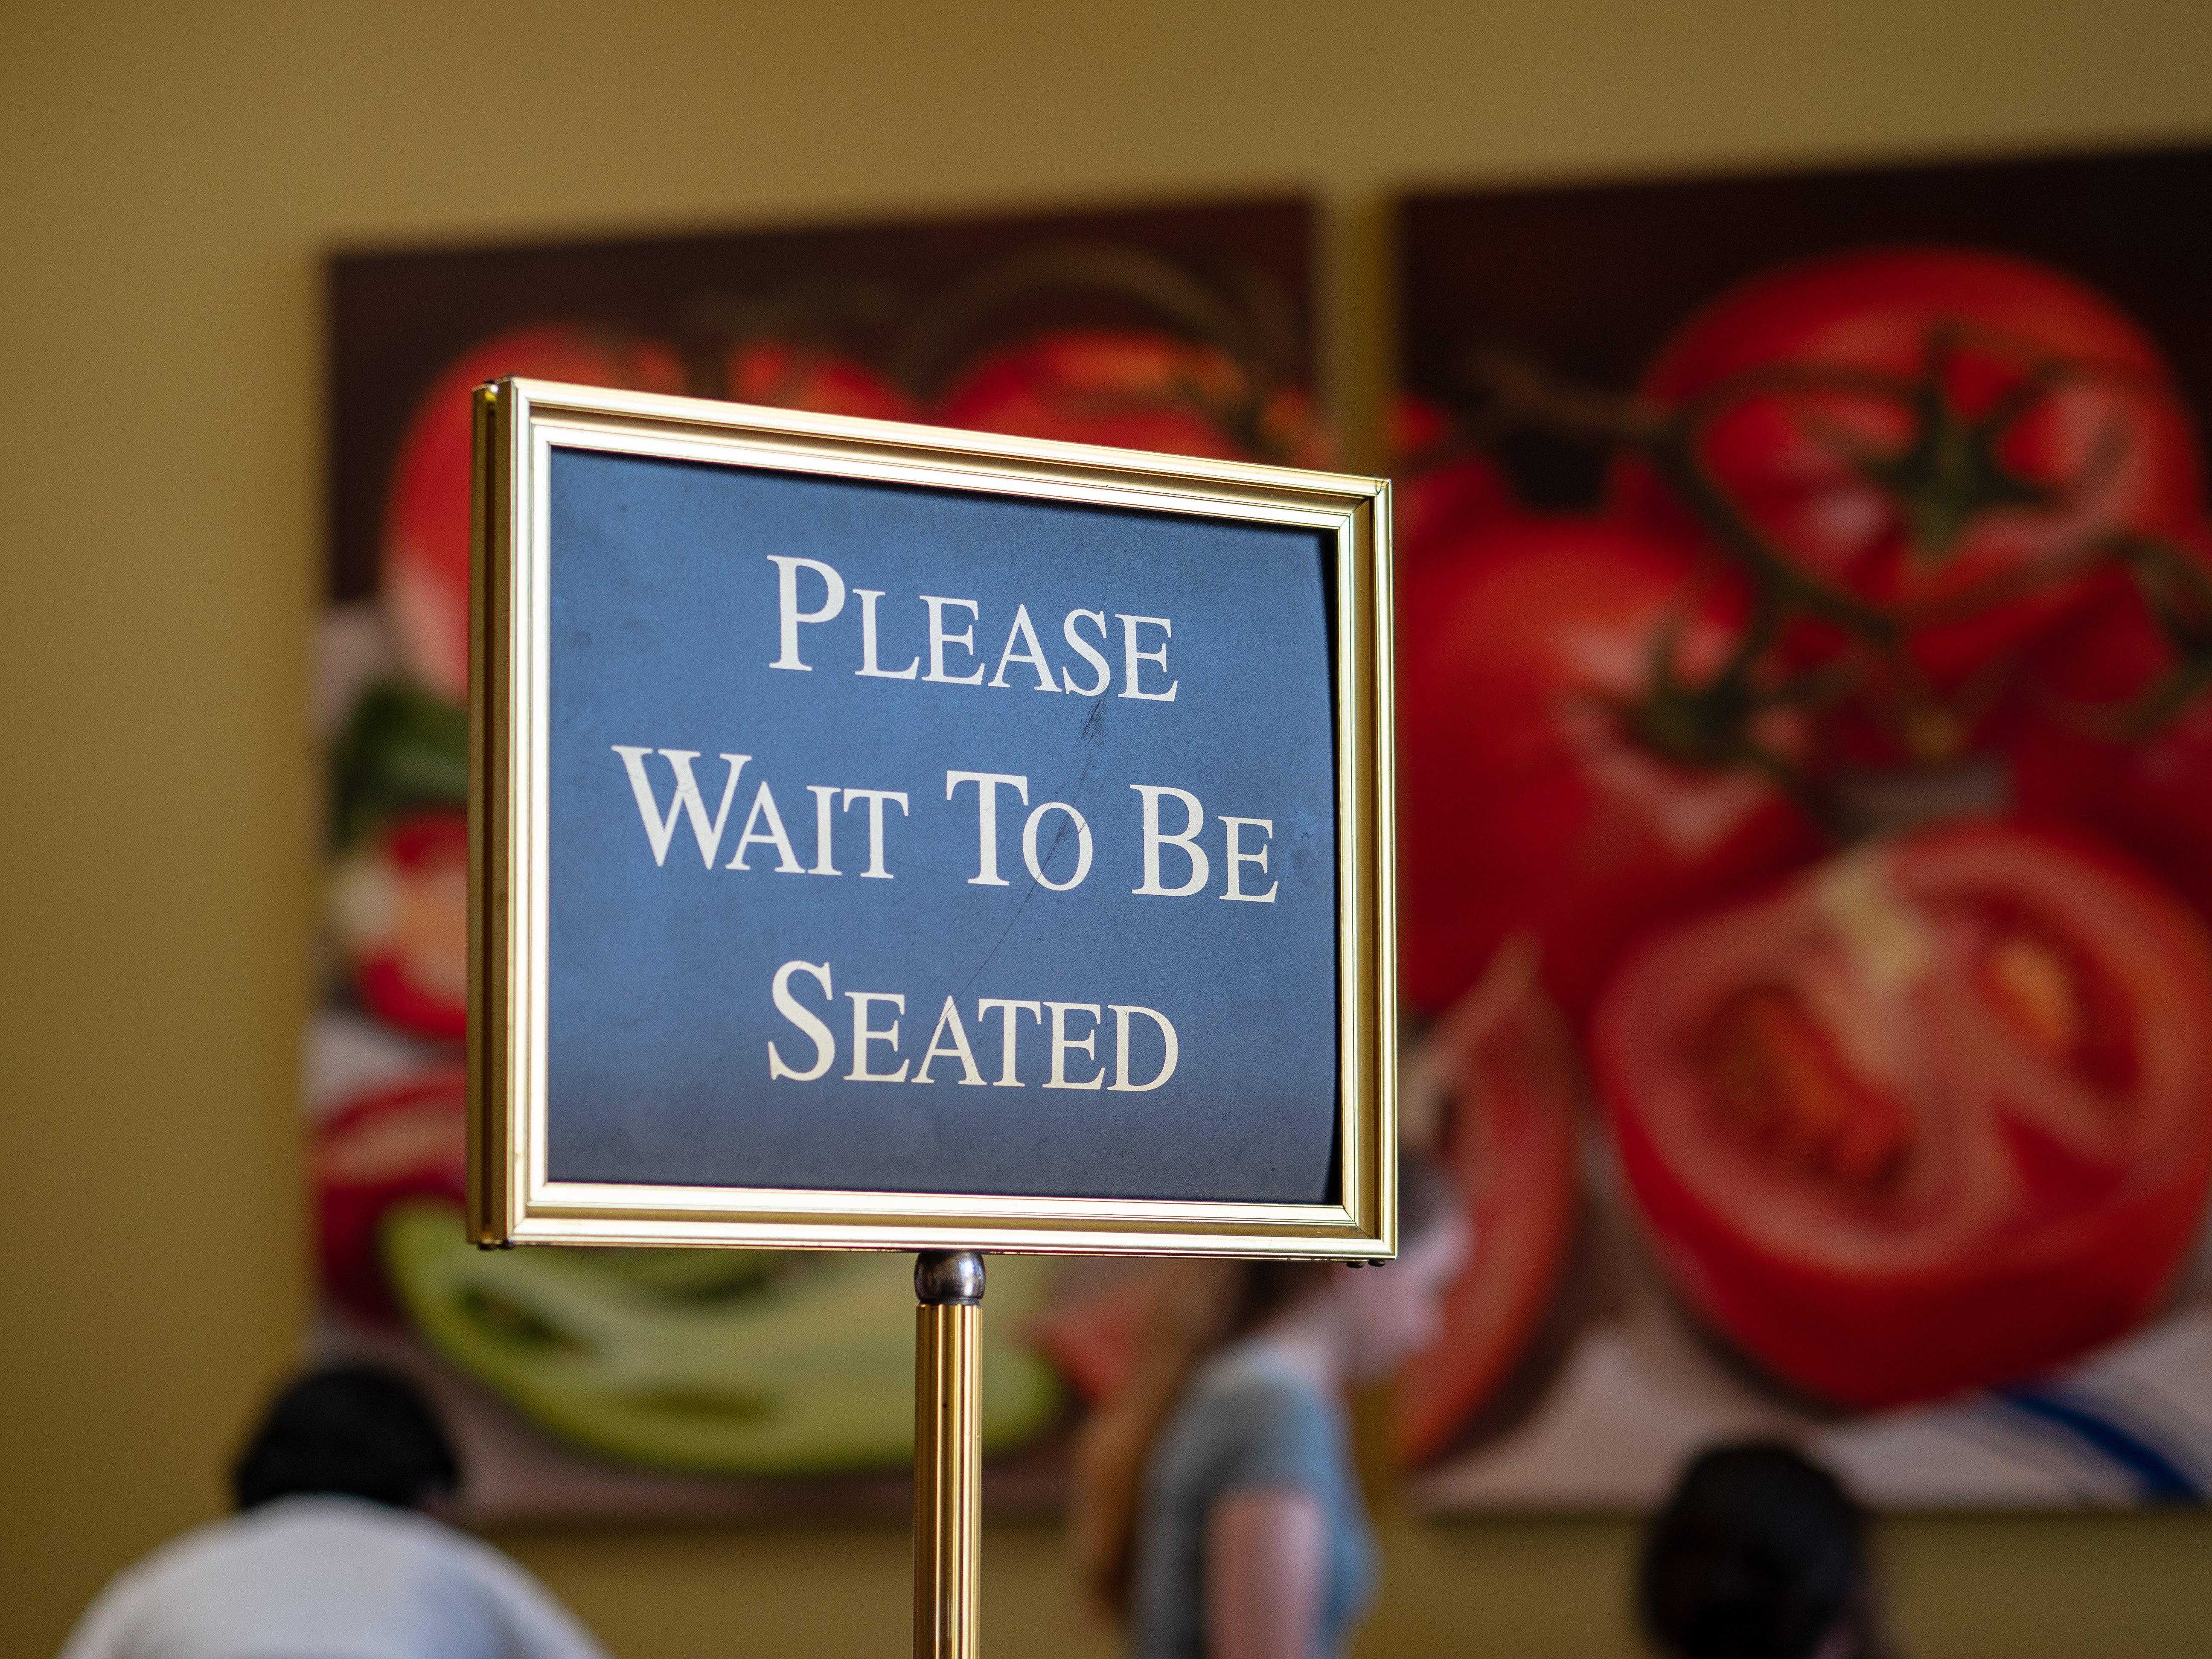 5-effective-ways-to-reduce-restaurant-wait-times